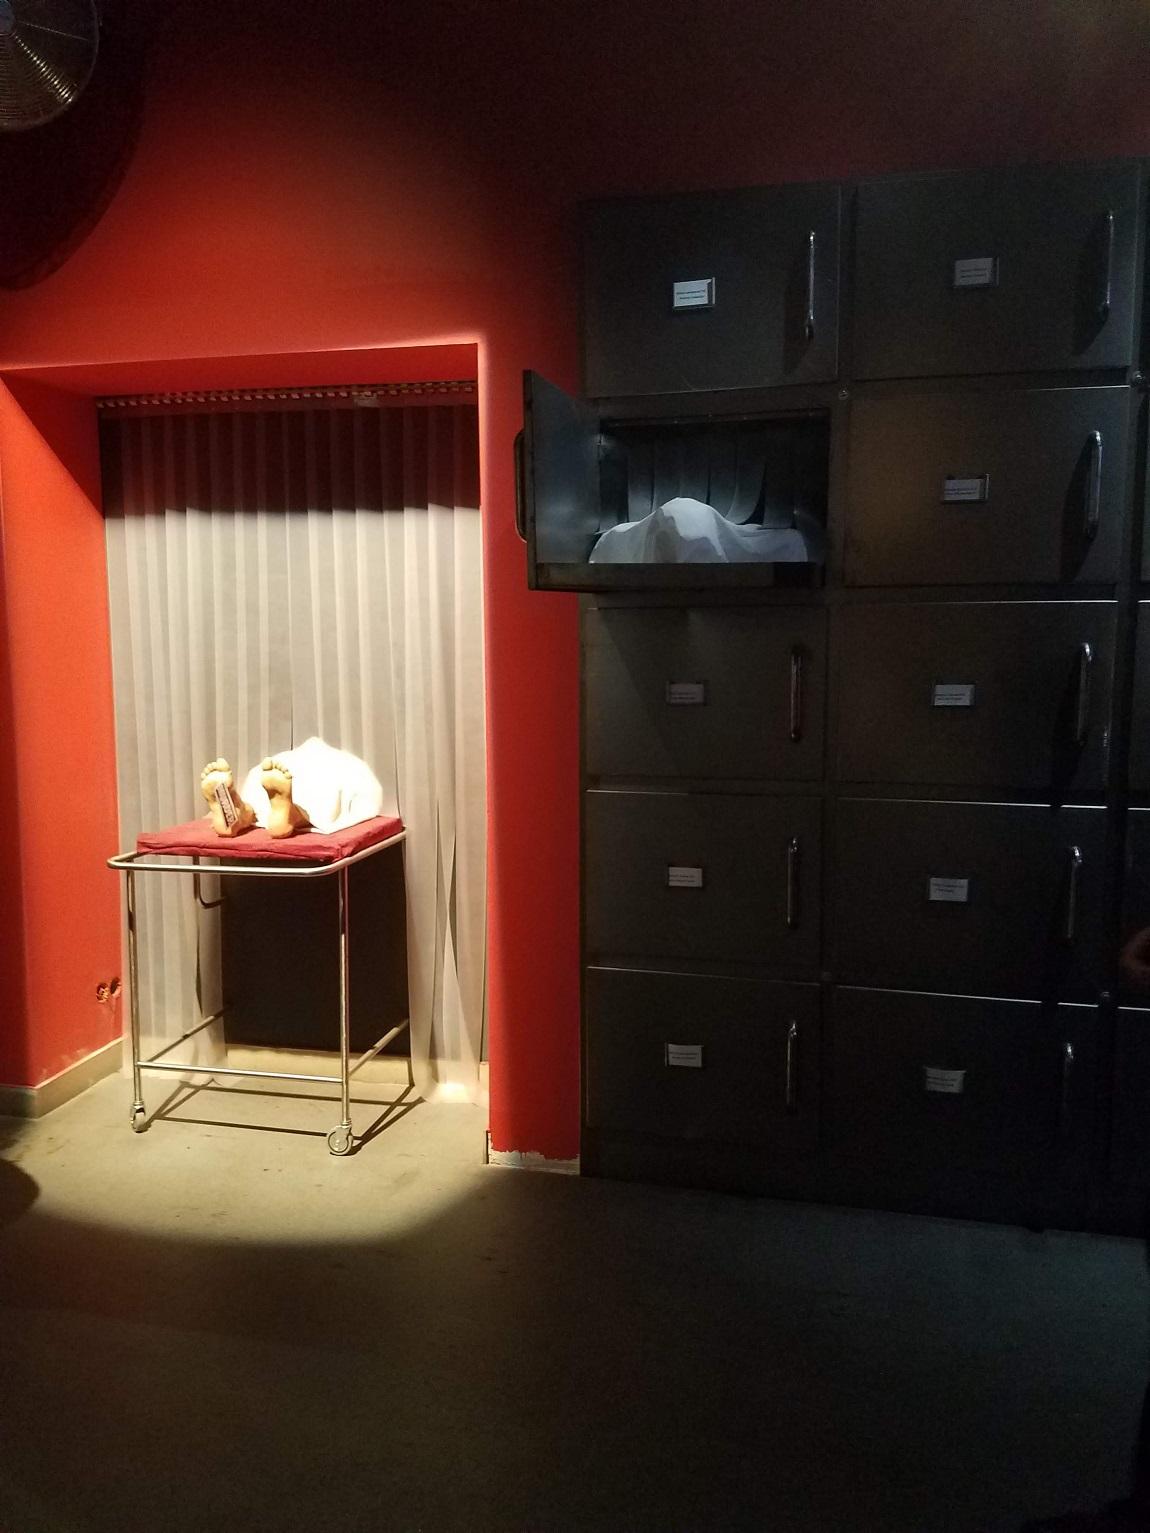 Entrance to Murder Exhibit